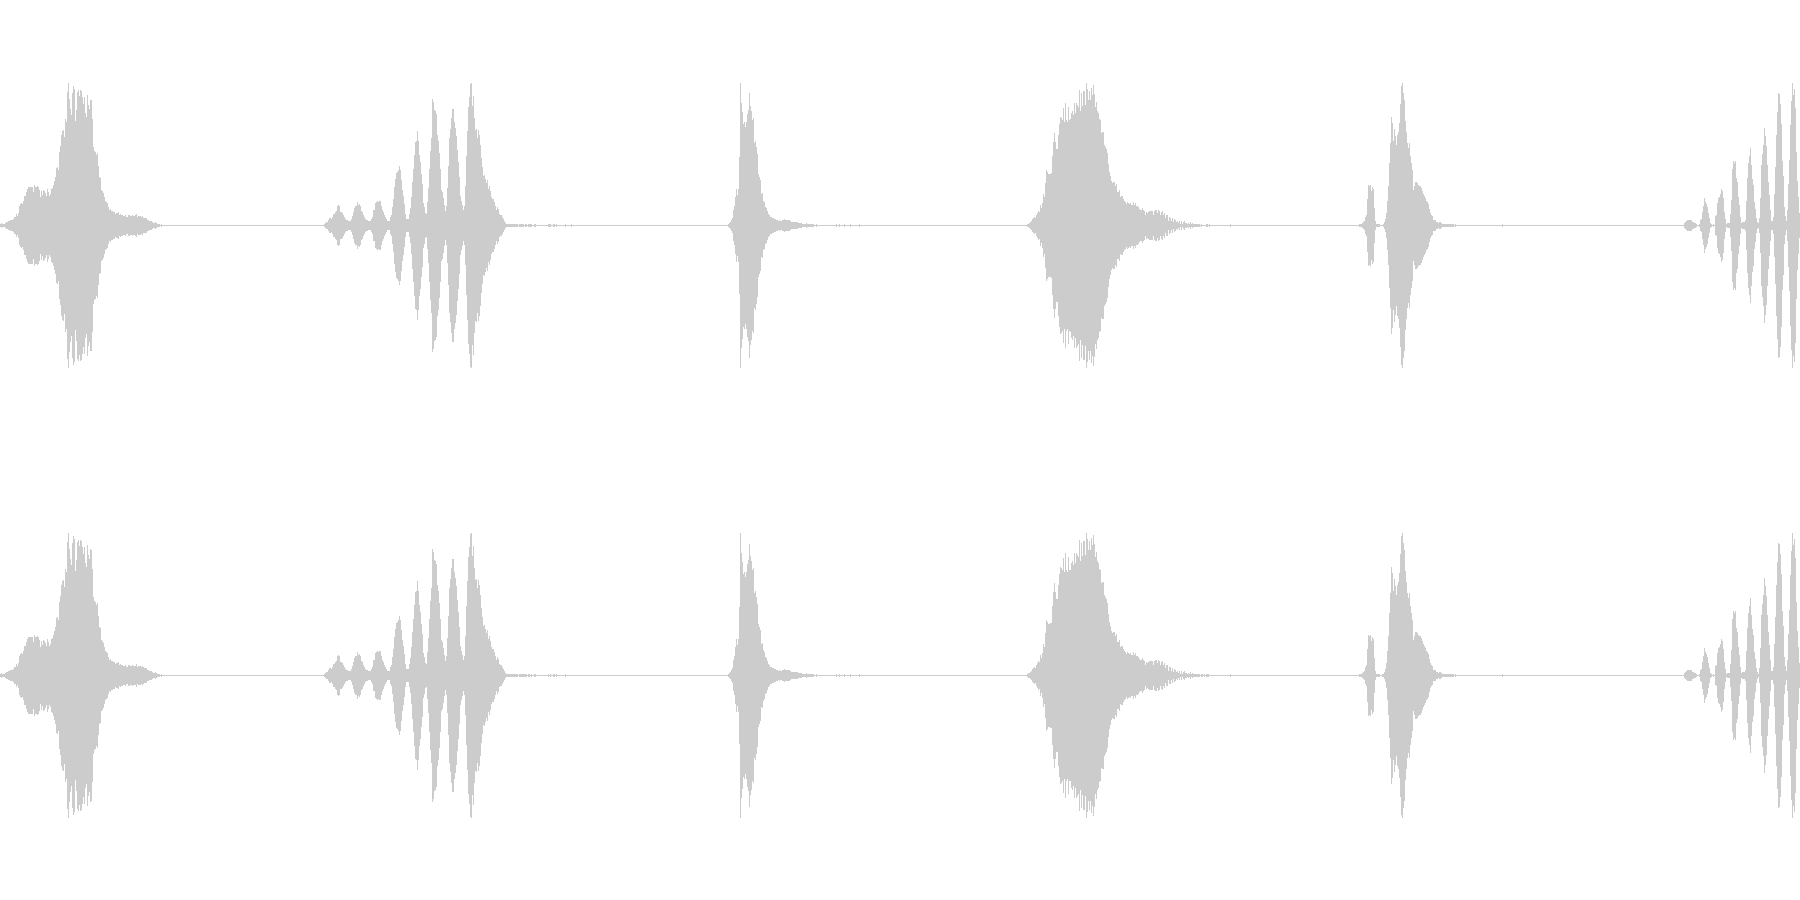 whiの風マルチwavの未再生の波形